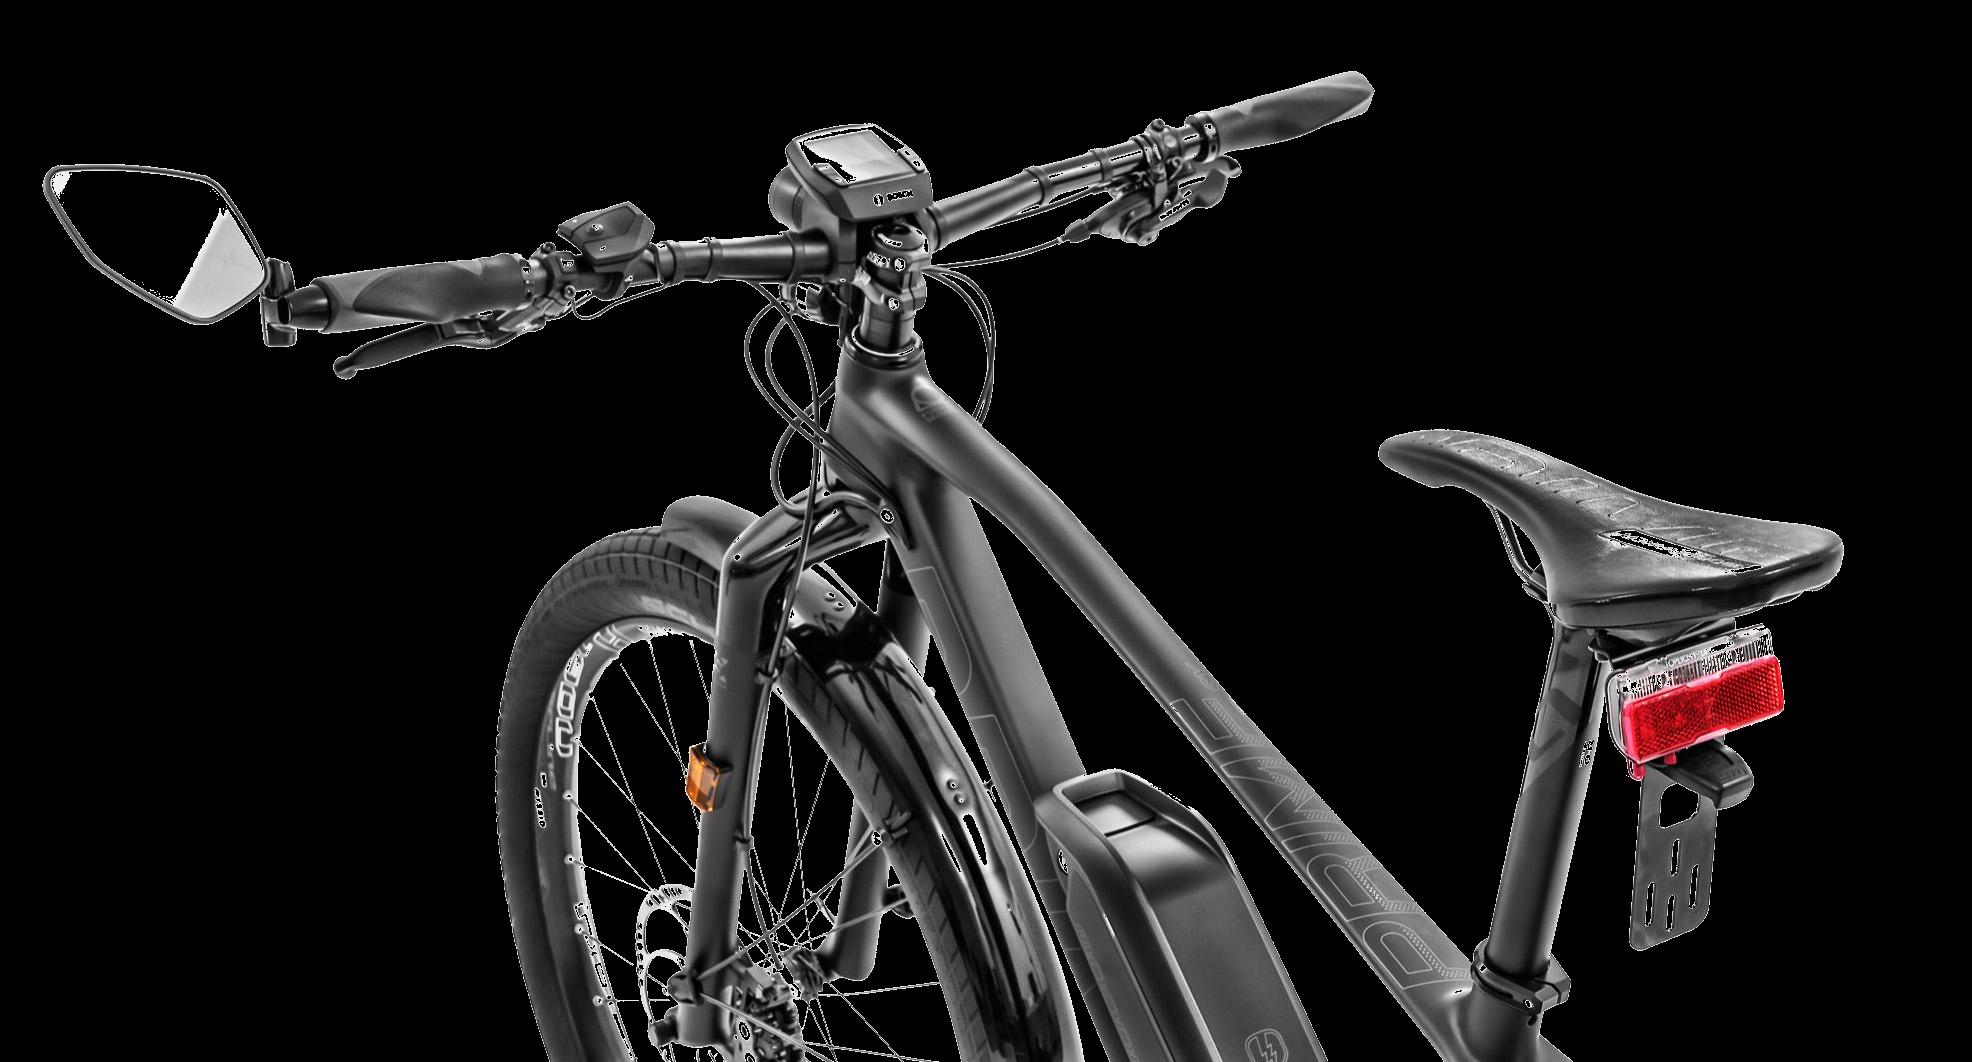 https://w8w5m3f8.stackpathcdn.com/17184/vtt-electrique-speedbike-prime-carbon-noir-sx-45kmh-500wh-275.jpg